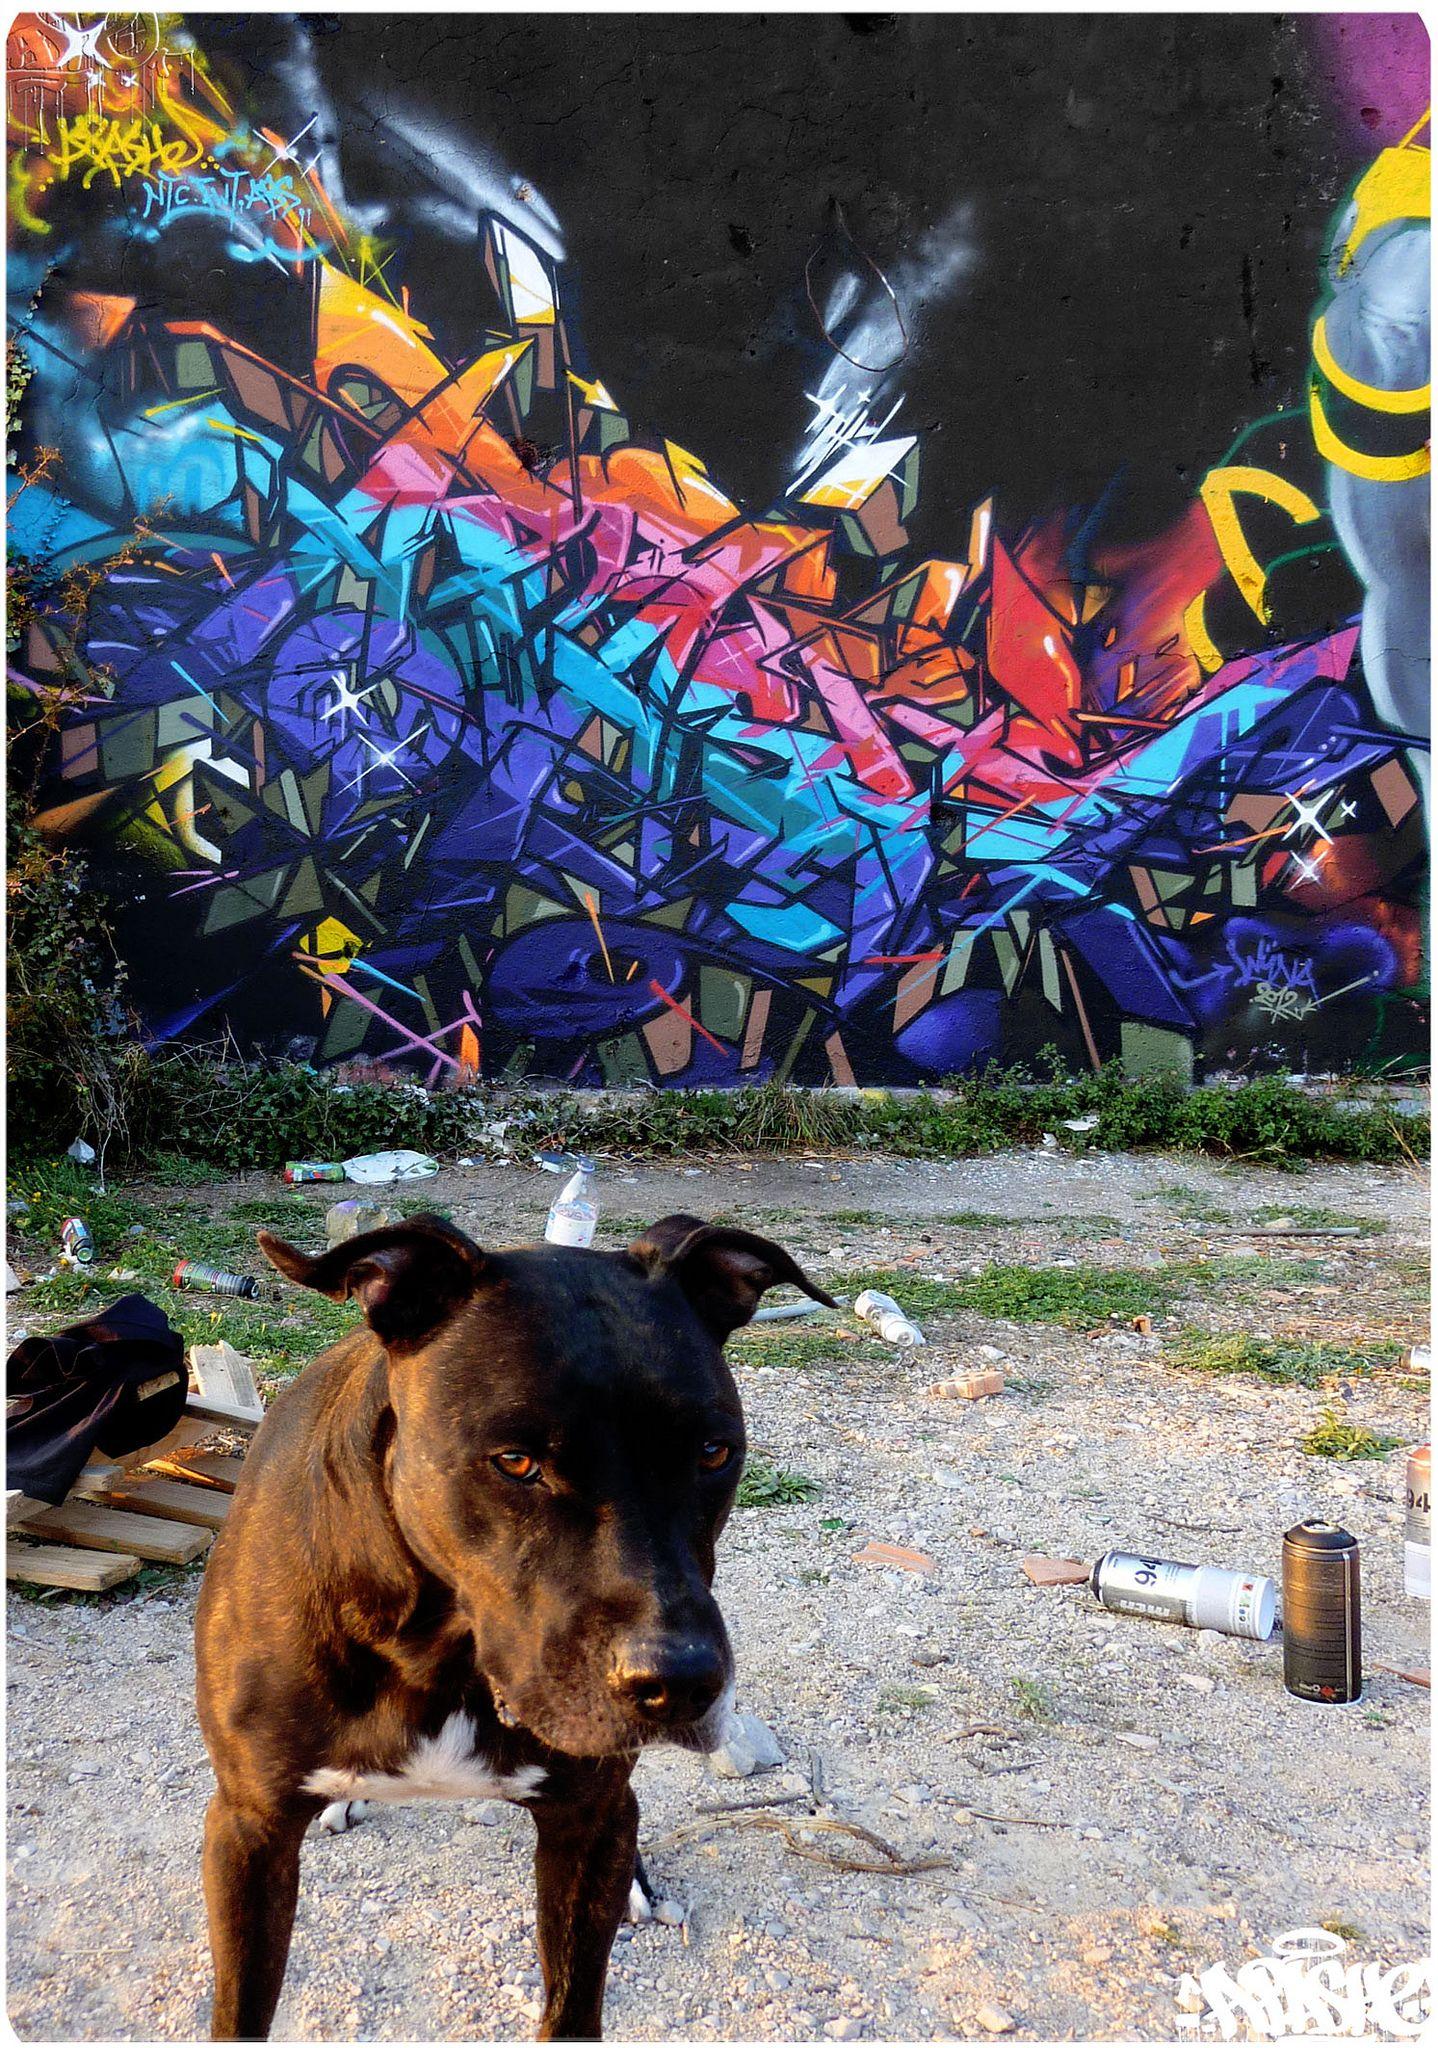 https://flic.kr/p/dcLySm   APASHE   MONACO 2012 #monacograffiti #graffiti #apashegraffiti #graff #apashe #sprayart #art #spraycan #spraycanart